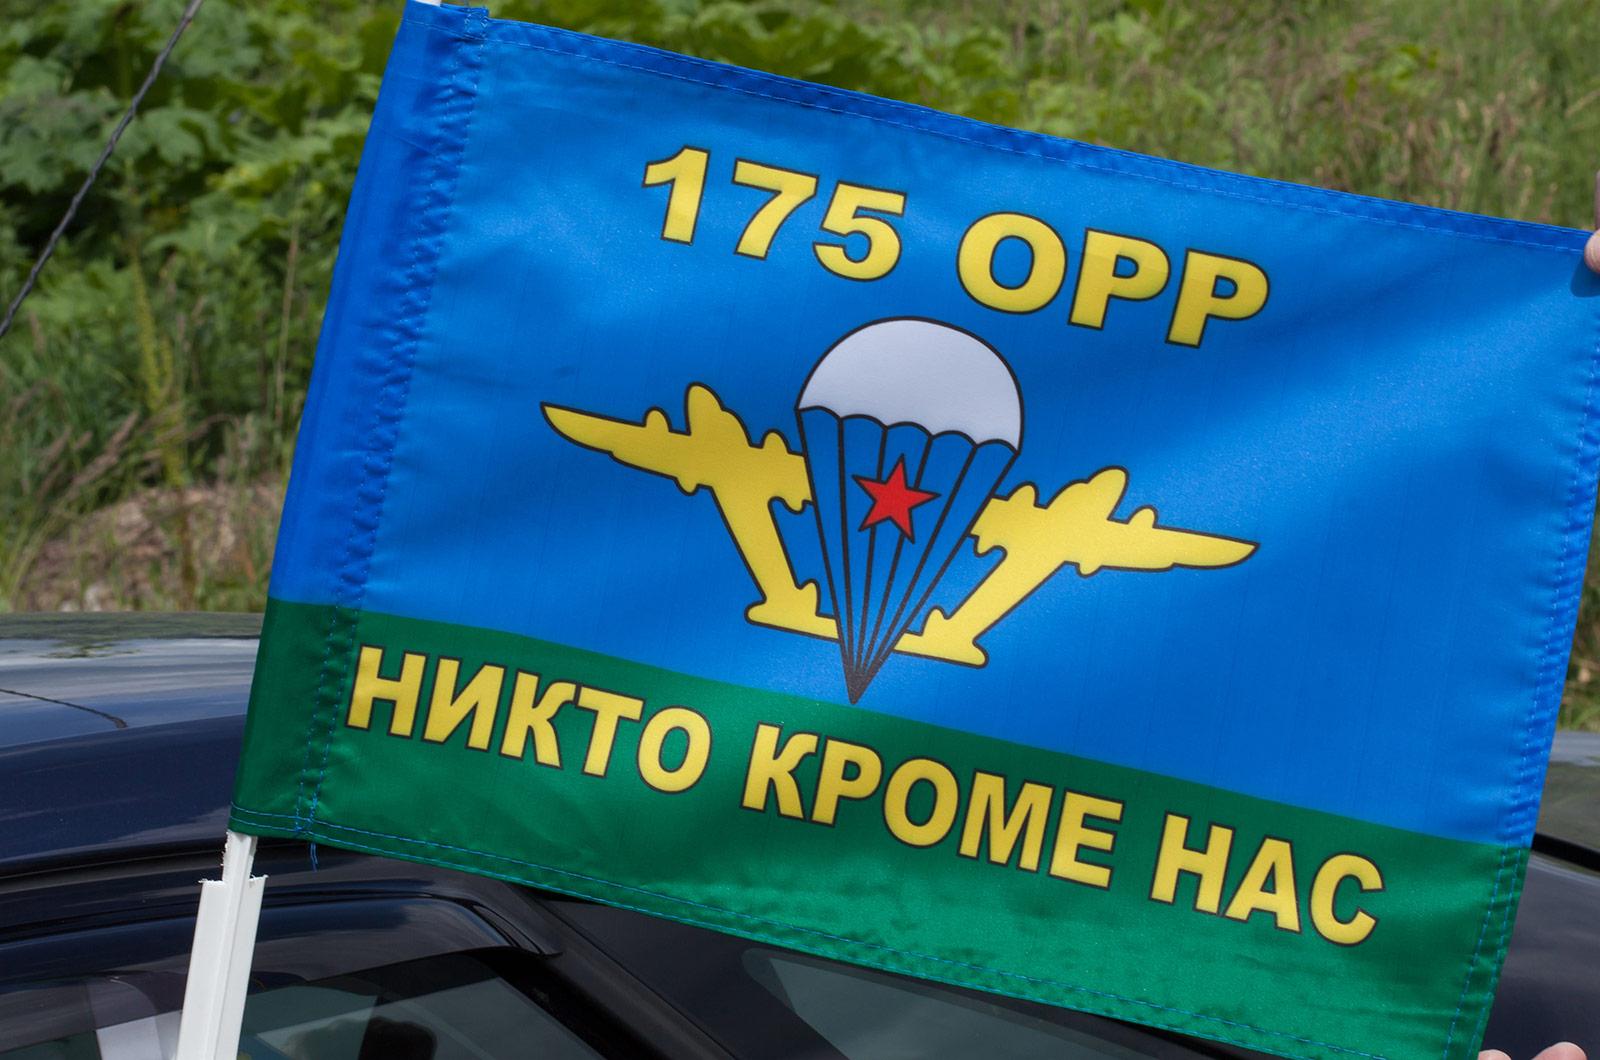 Флаг на машину с кронштейном ВДВ 175 ОРР